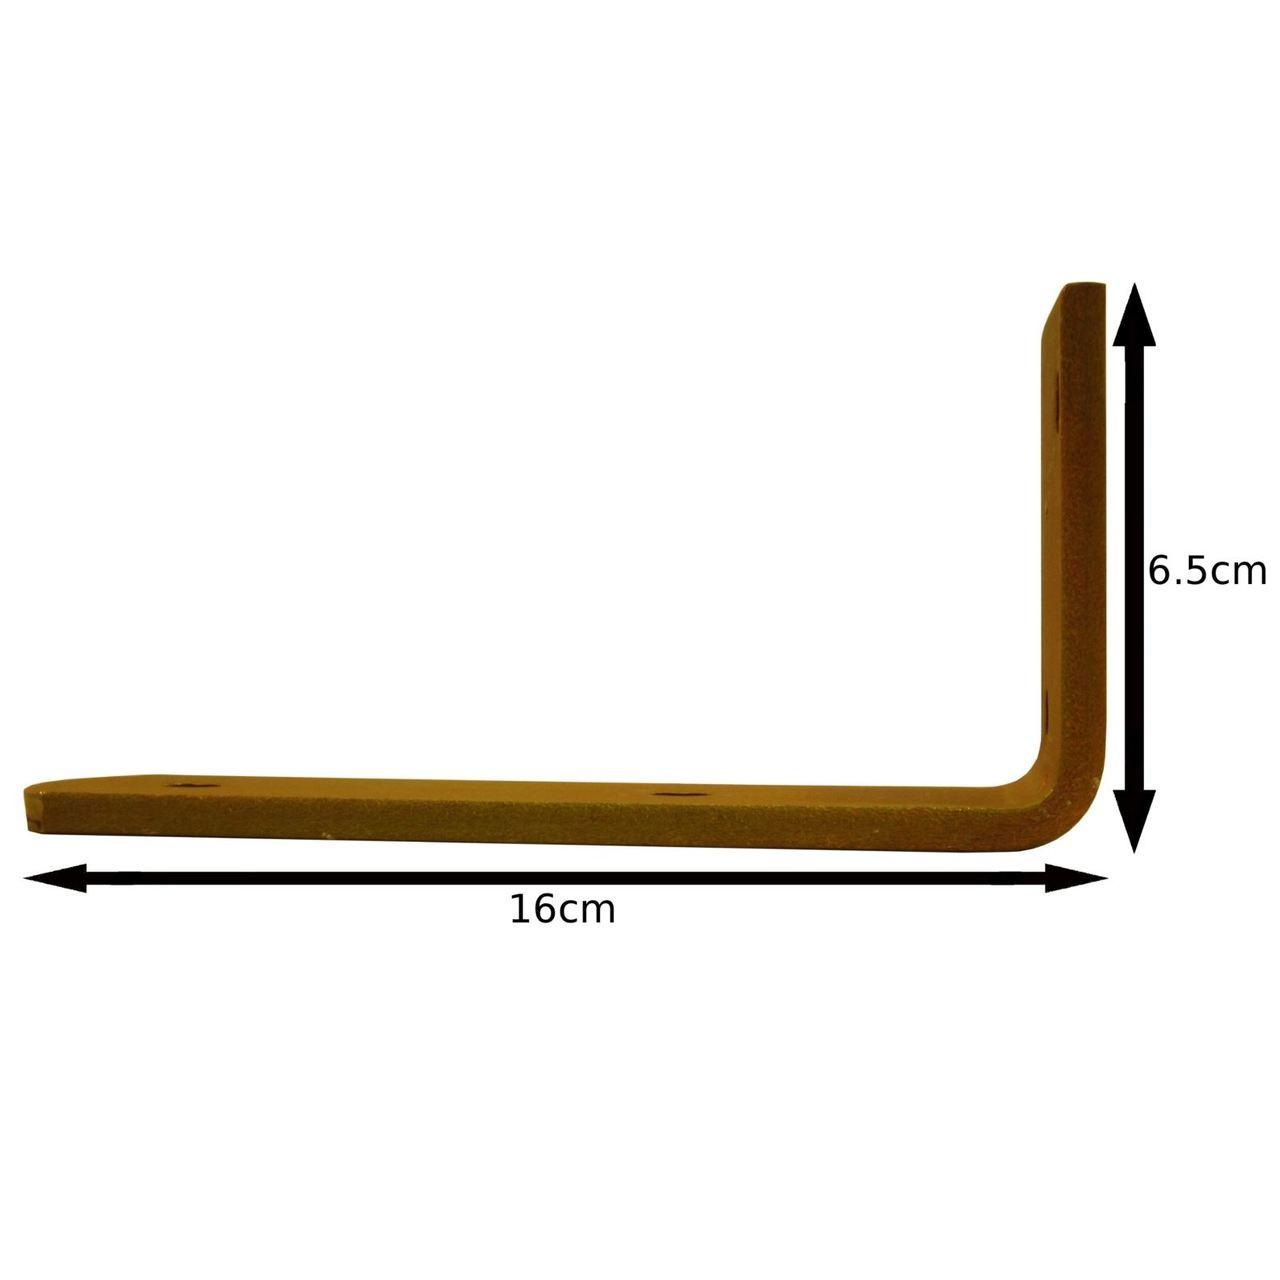 S Trailer Mudguard Angle Bracket HEAVY DUTY 90 degree Corner Brace PAIR TR083